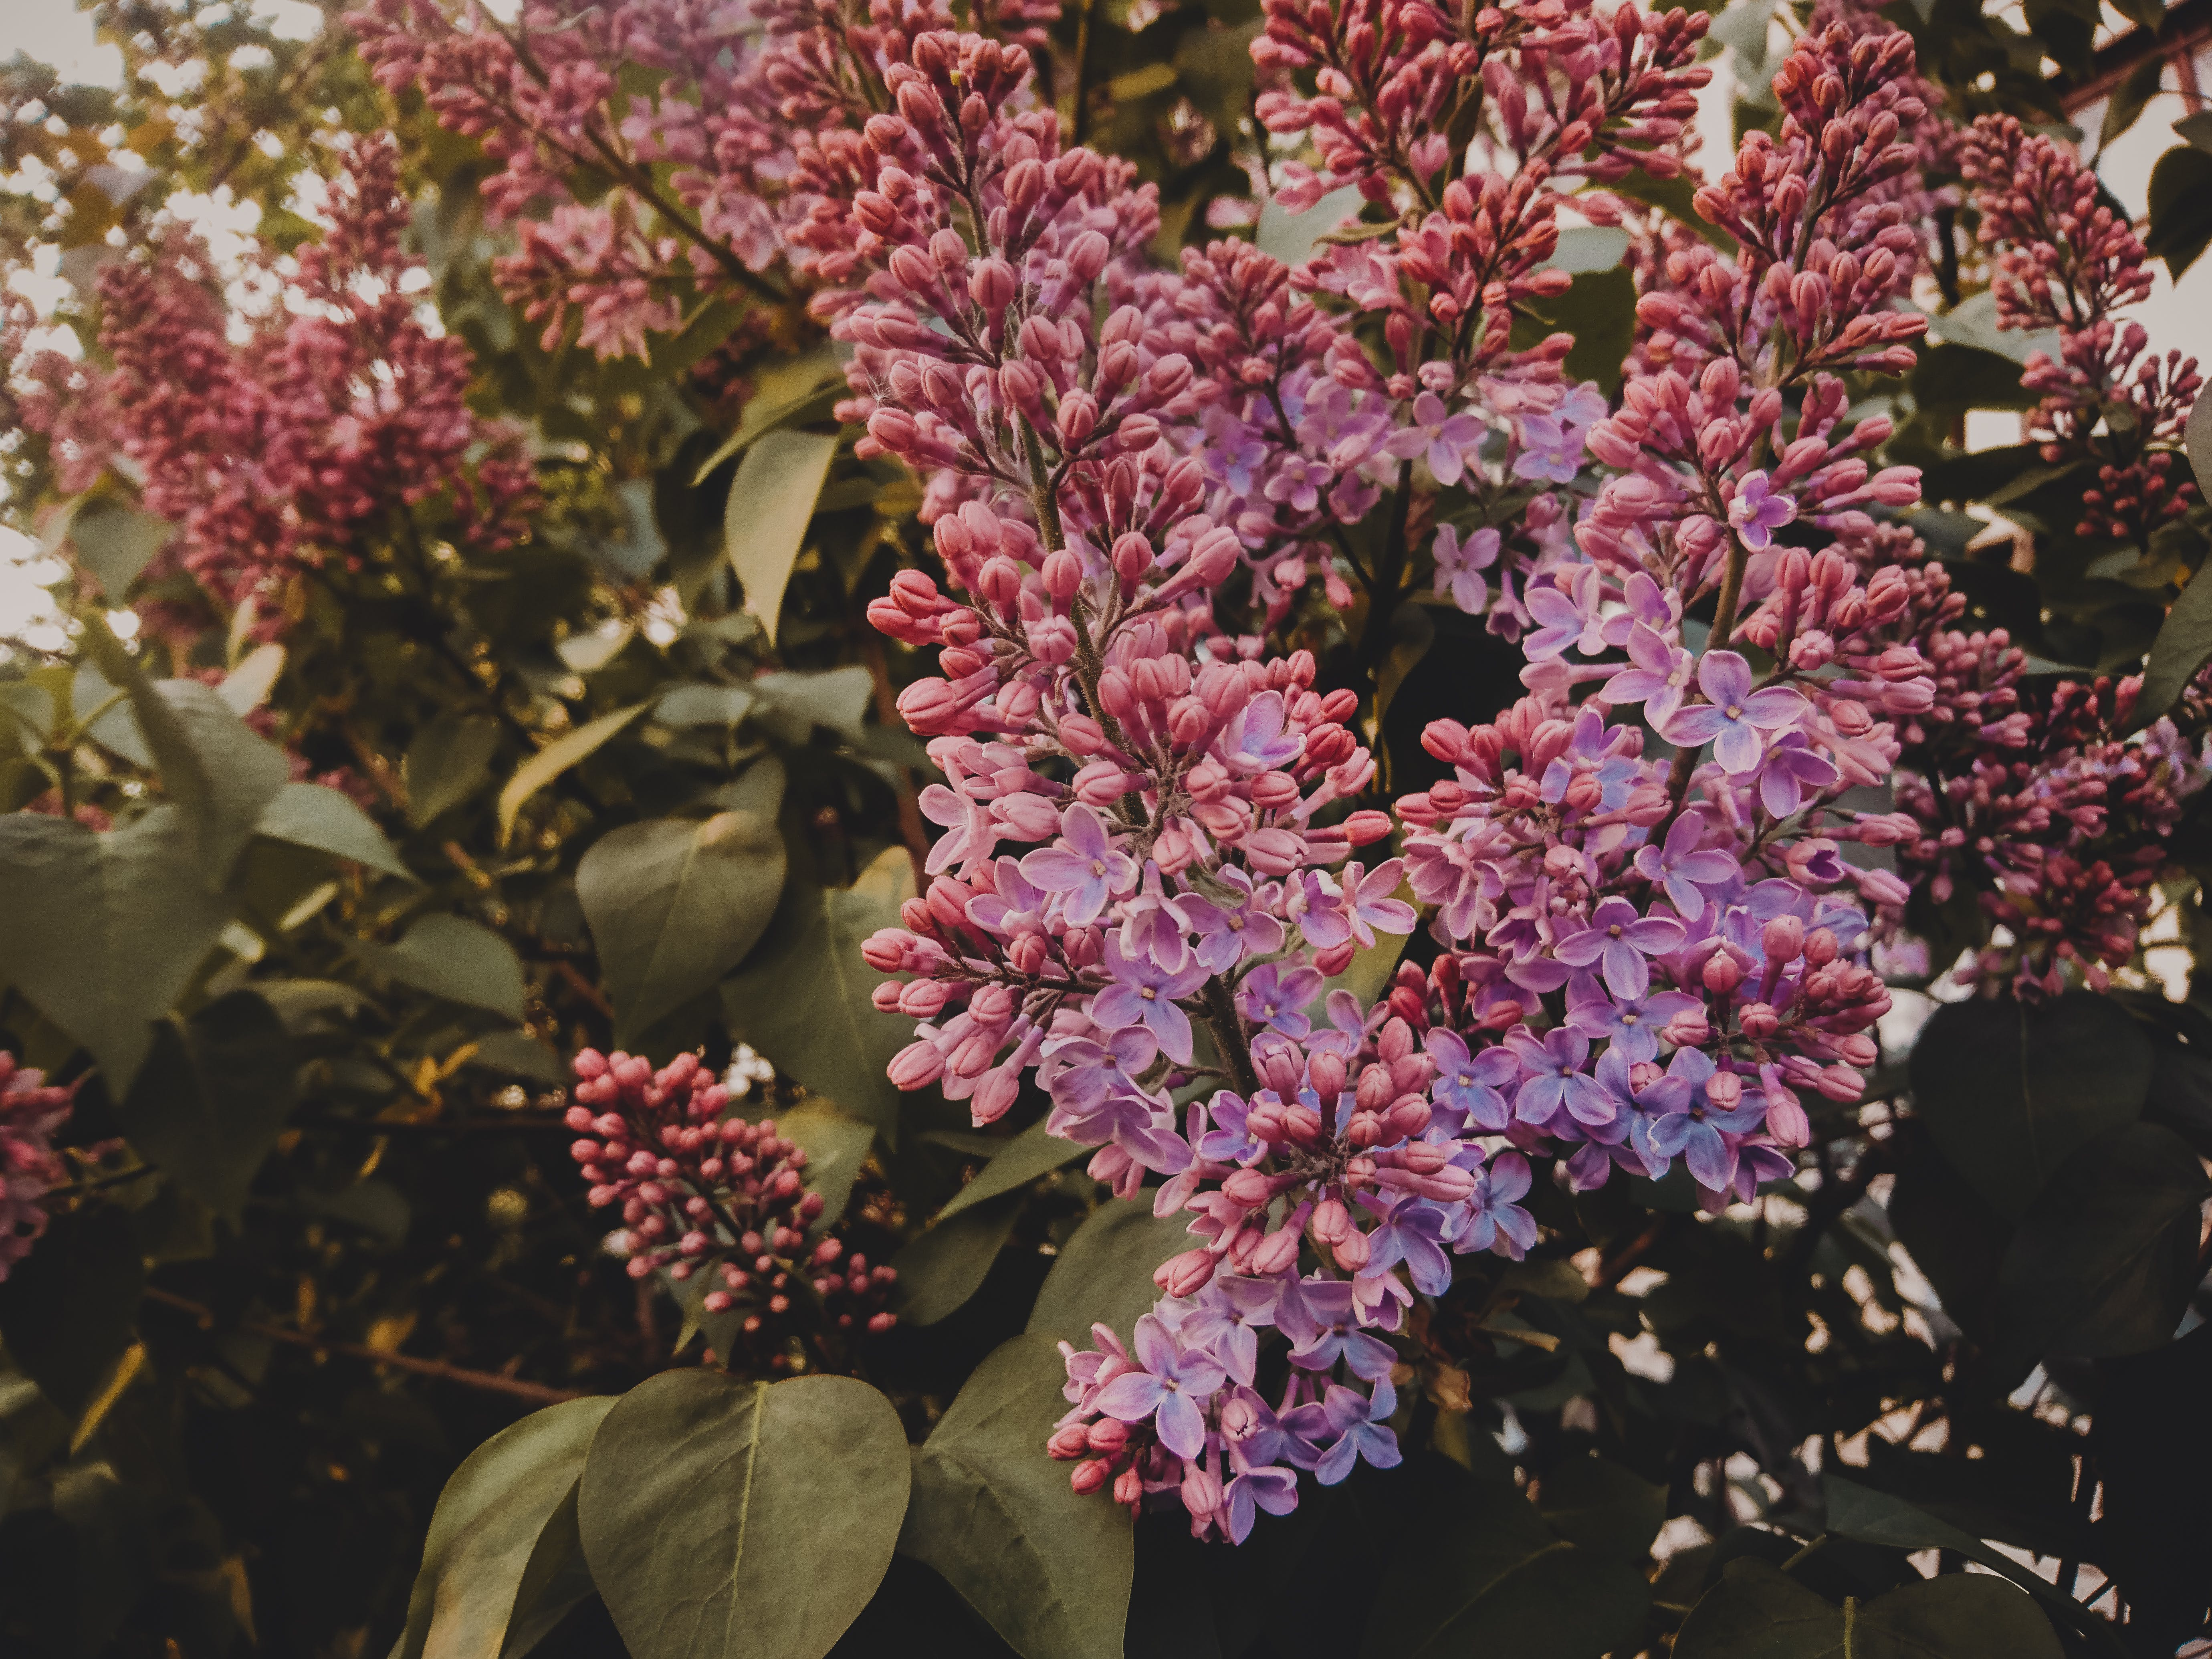 Kostenloses Stock Foto zu blumen, blüte, blütenblätter, blütenknospen